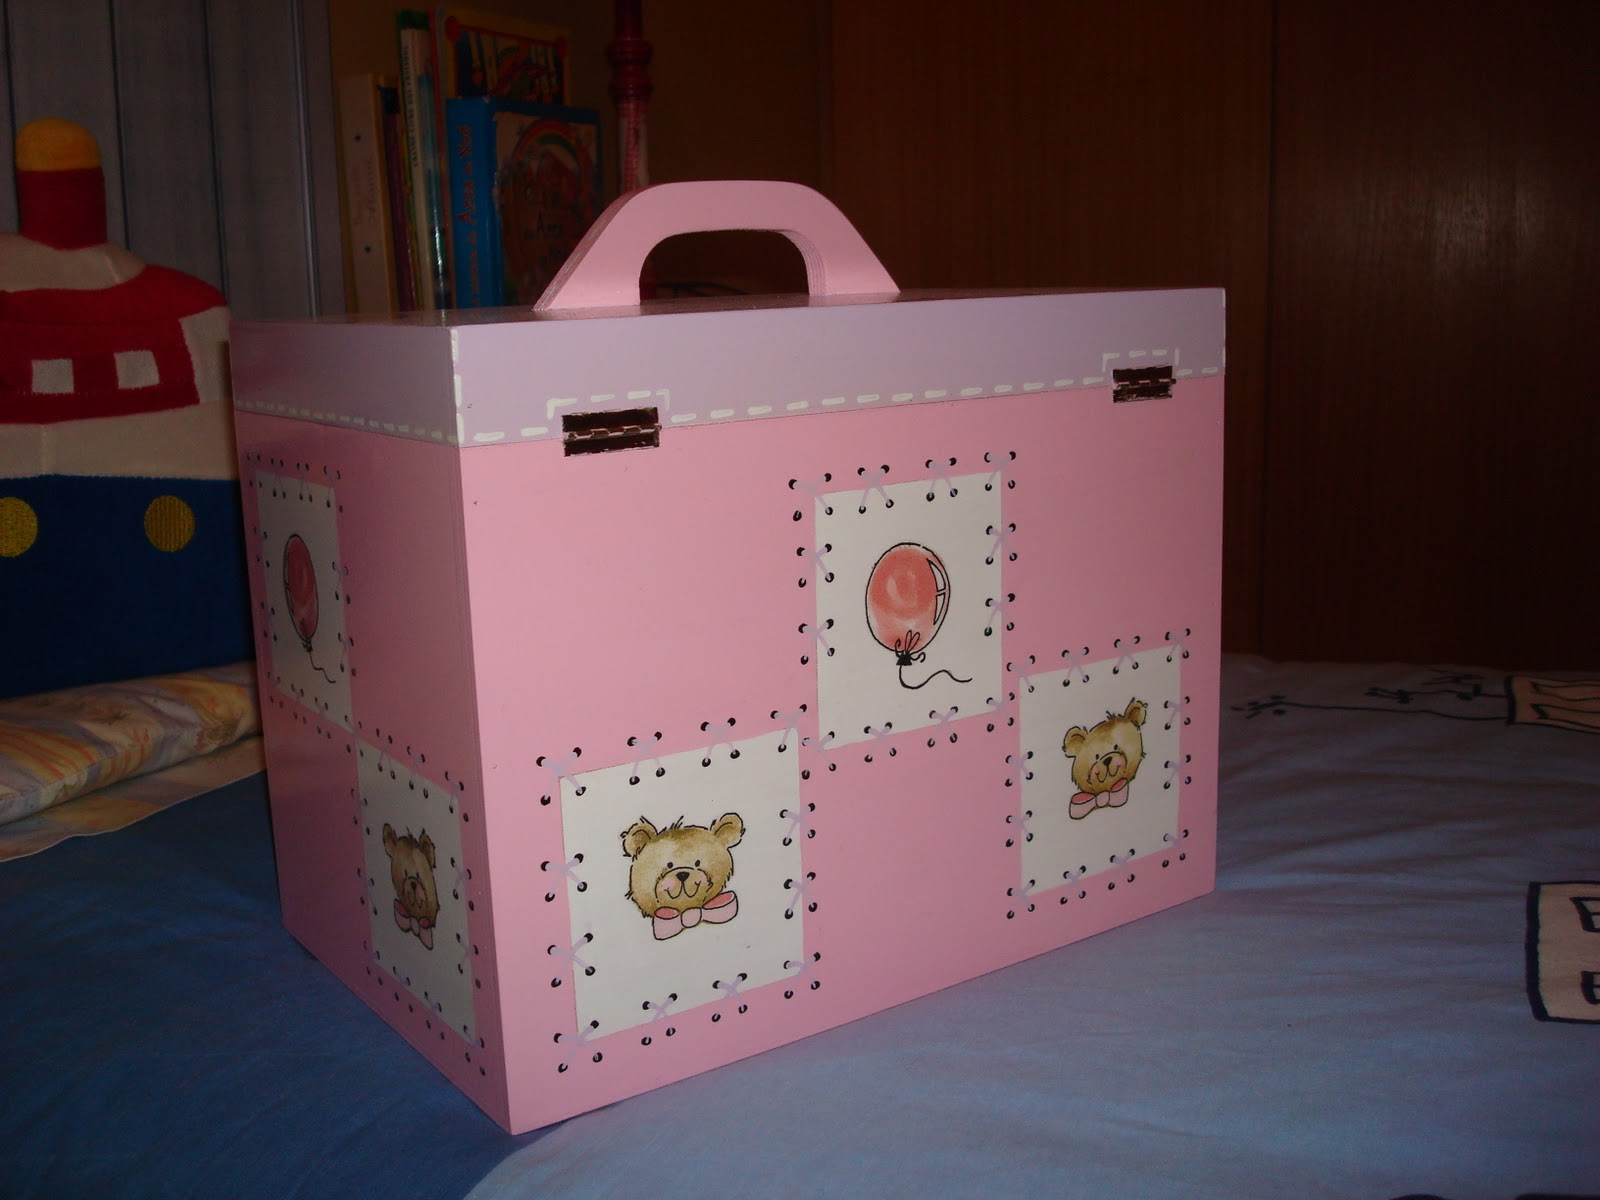 caixa de medicamentos ou necessaire caixa de madeira tintas acrilicas  #814A57 1600x1200